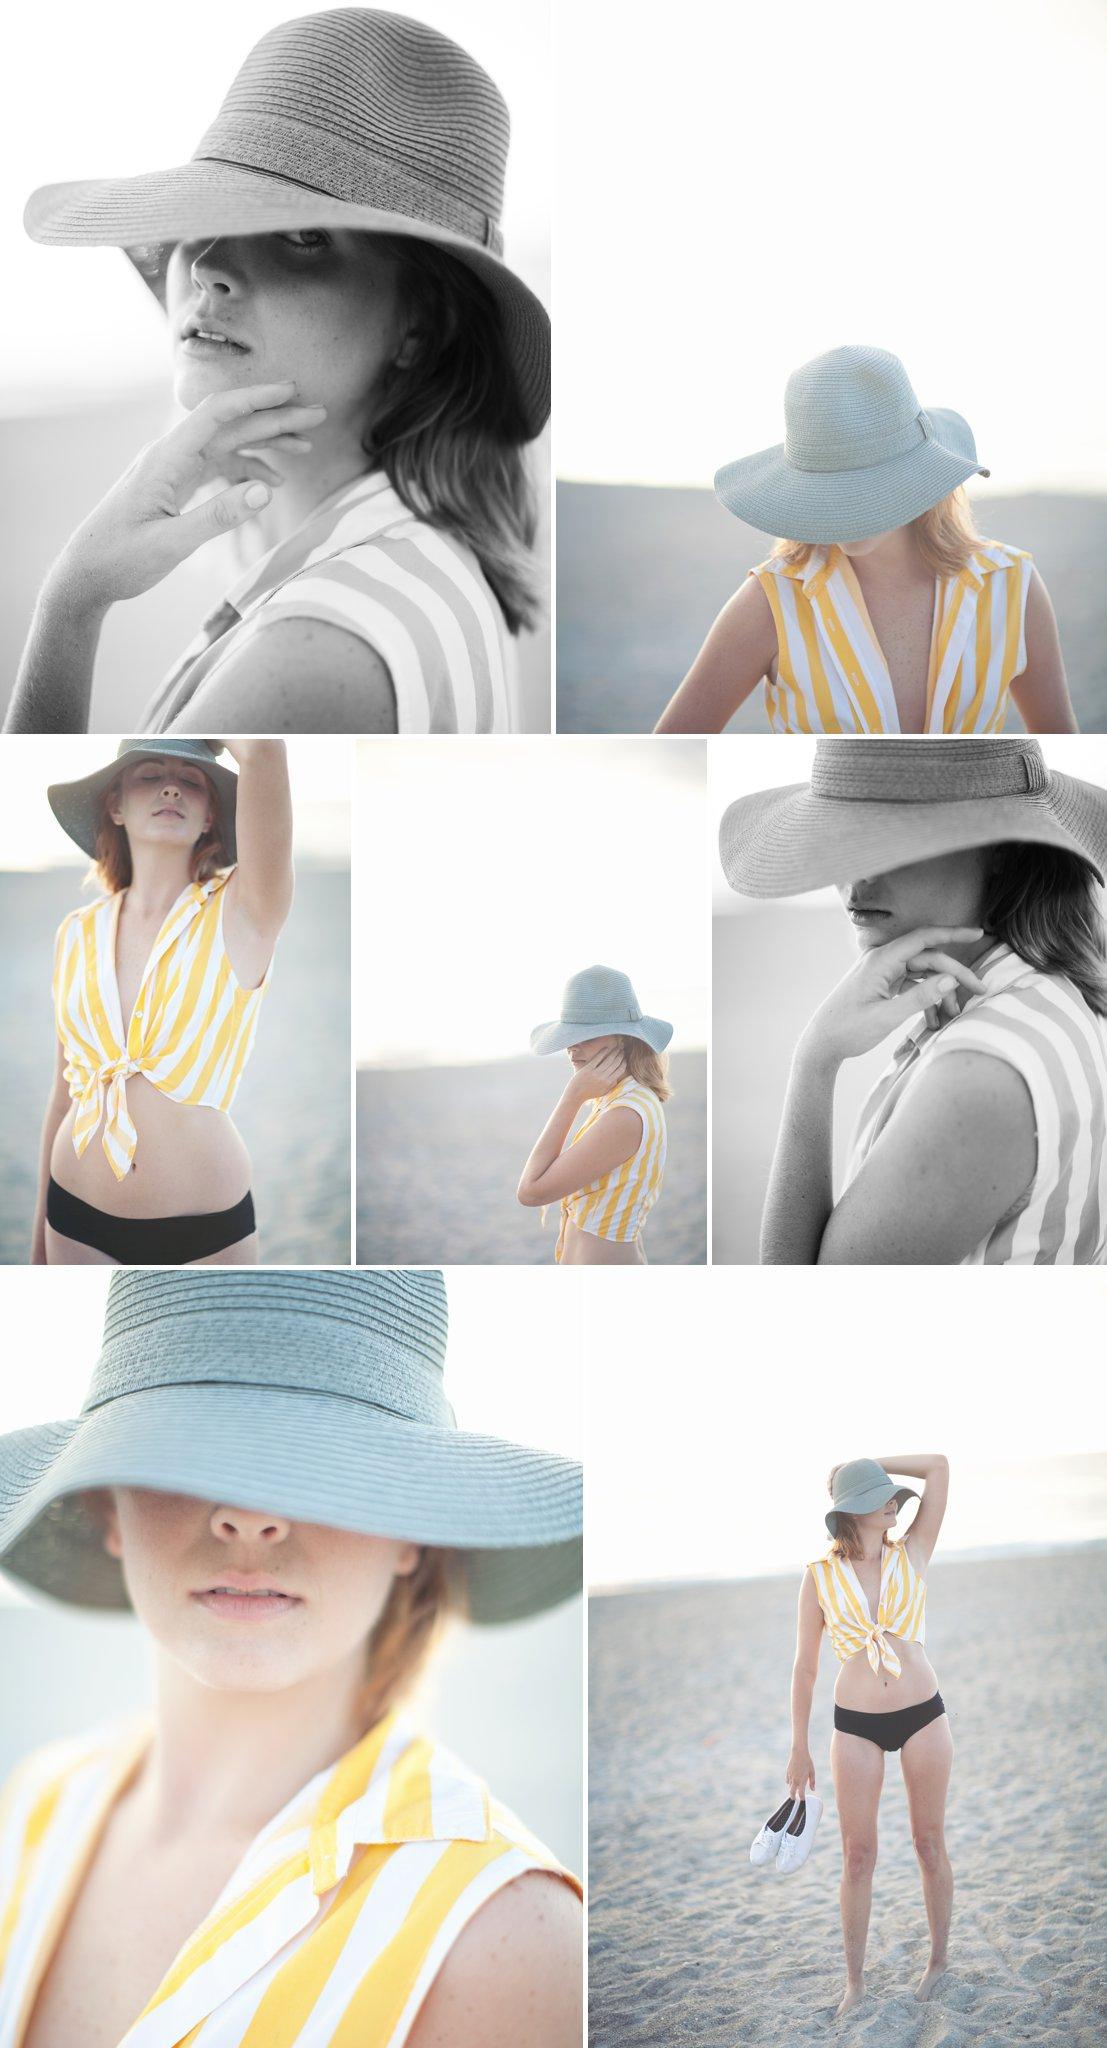 west palm beach branding photographer west palm beach headshot photographer shannon griffin photography_0030.jpg